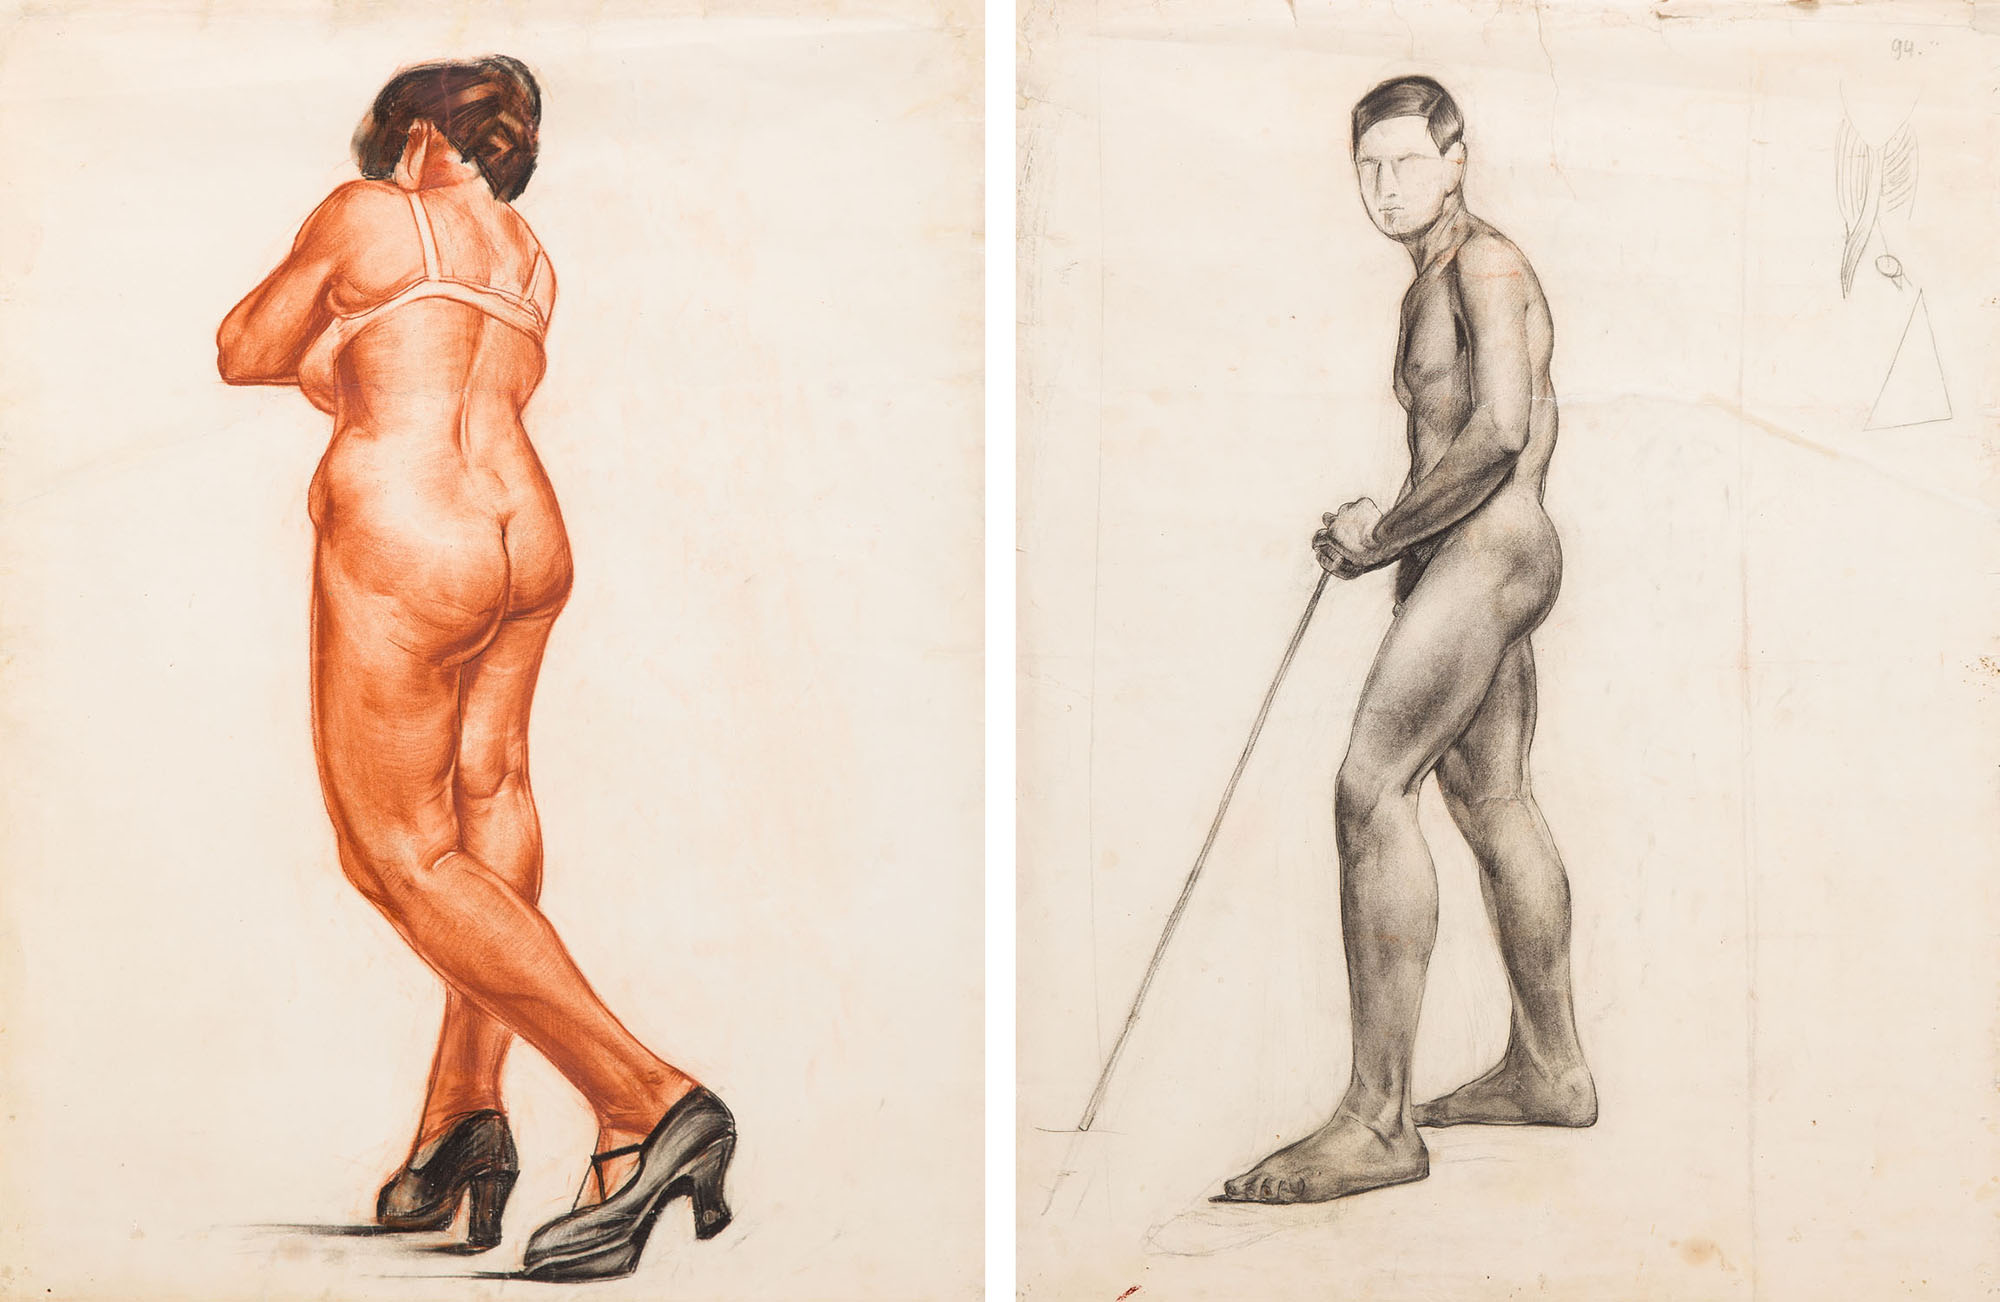 Akt stojącej kobiety w pantoflach na obcasach (Recto) / Akt stojącego mężczyzny (Verso), 1922